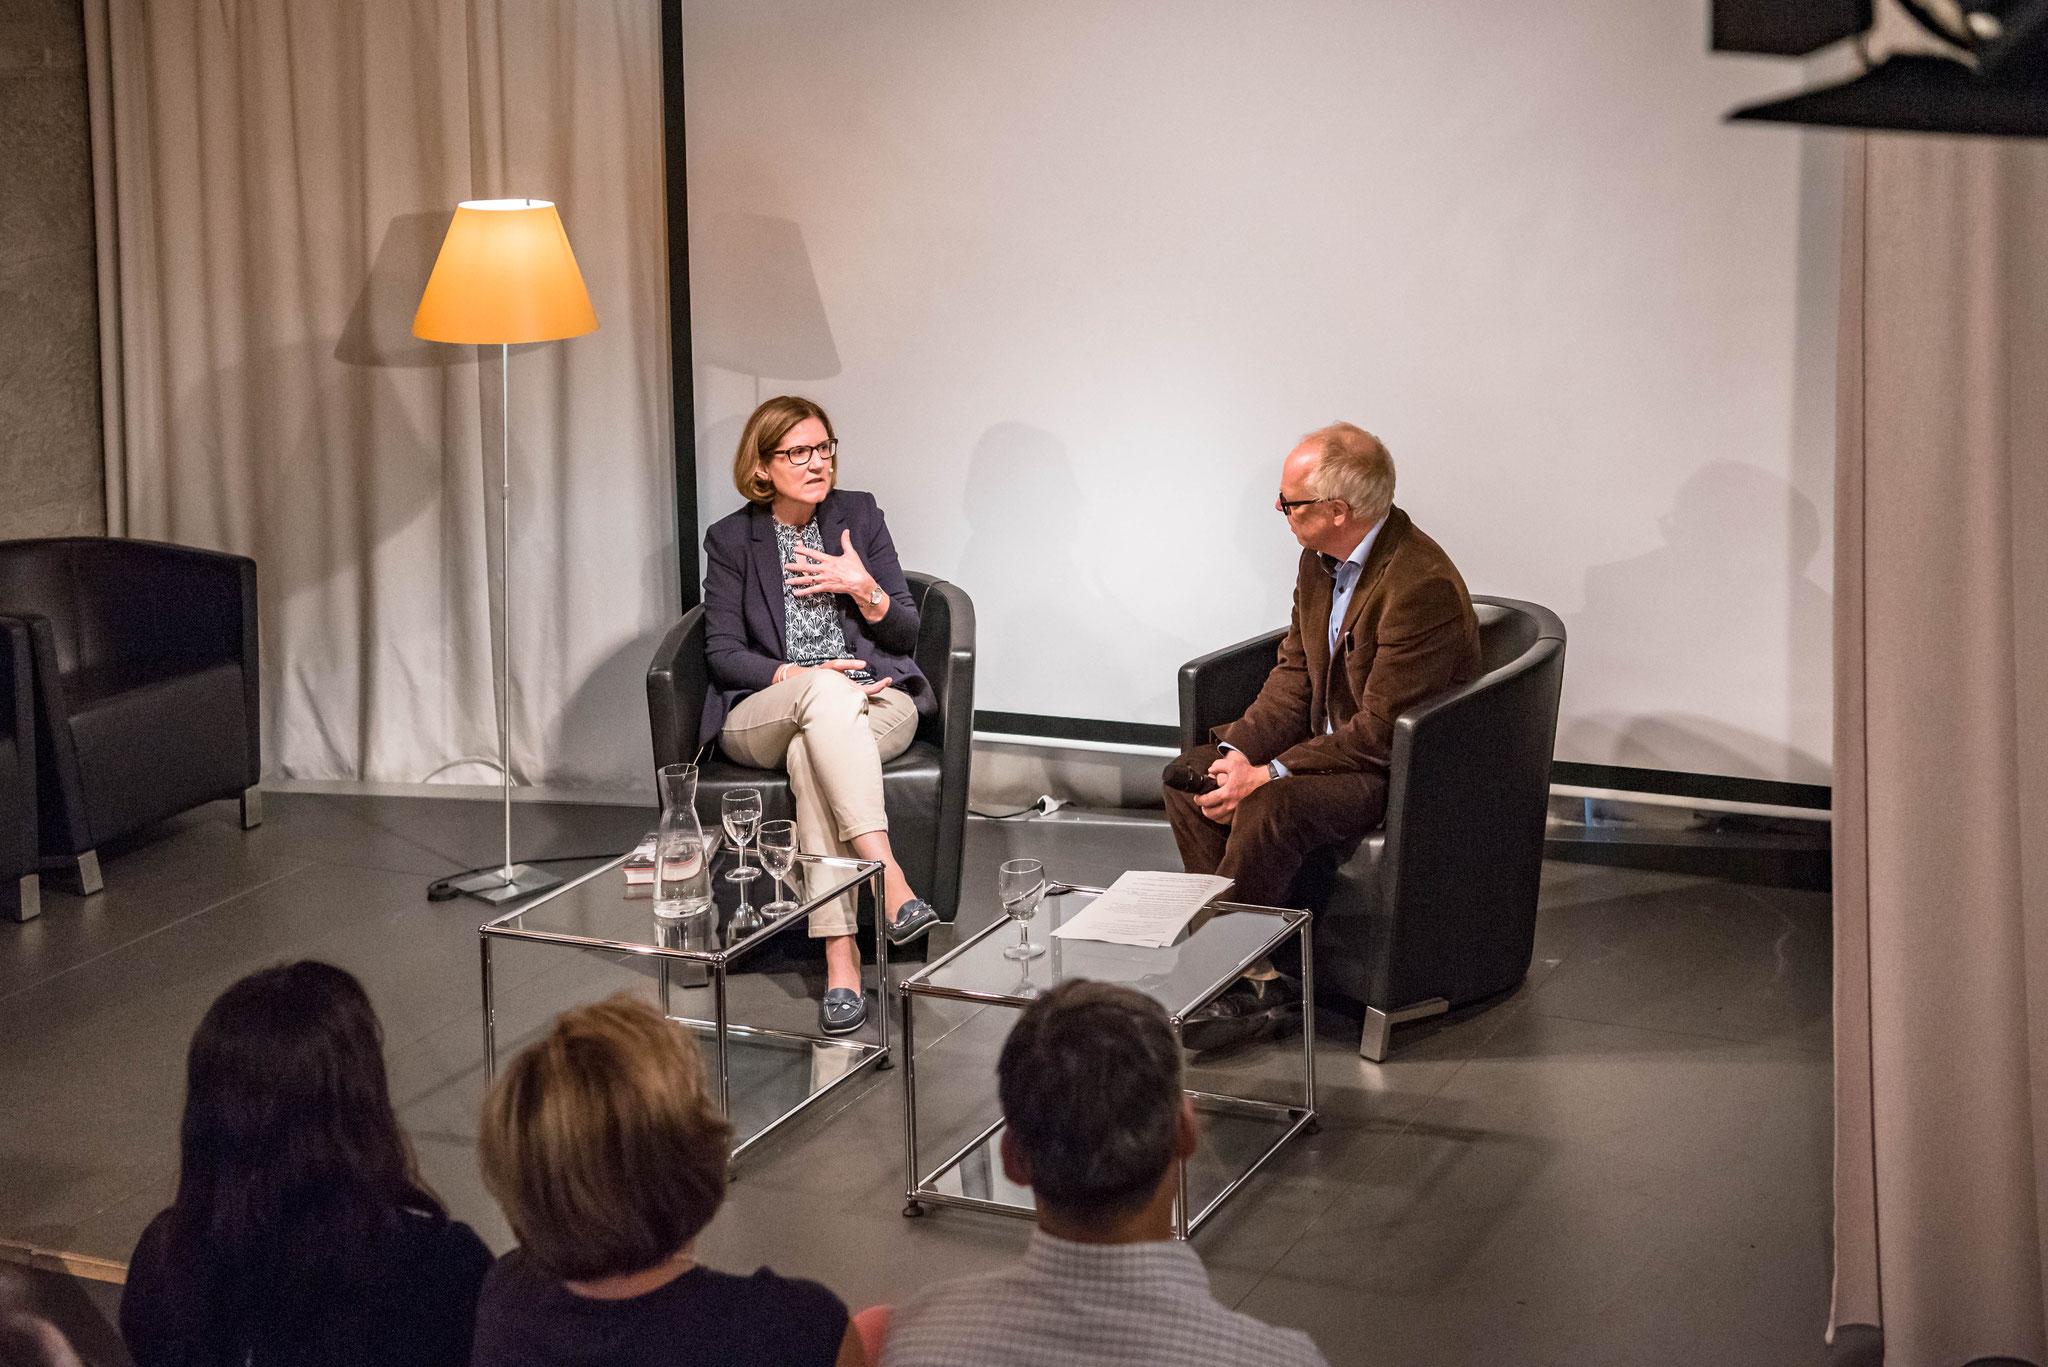 Regula Brühwiler-Giacometti und Thomas Göttin (Geschäftsleiter Polit-Forum Bern)